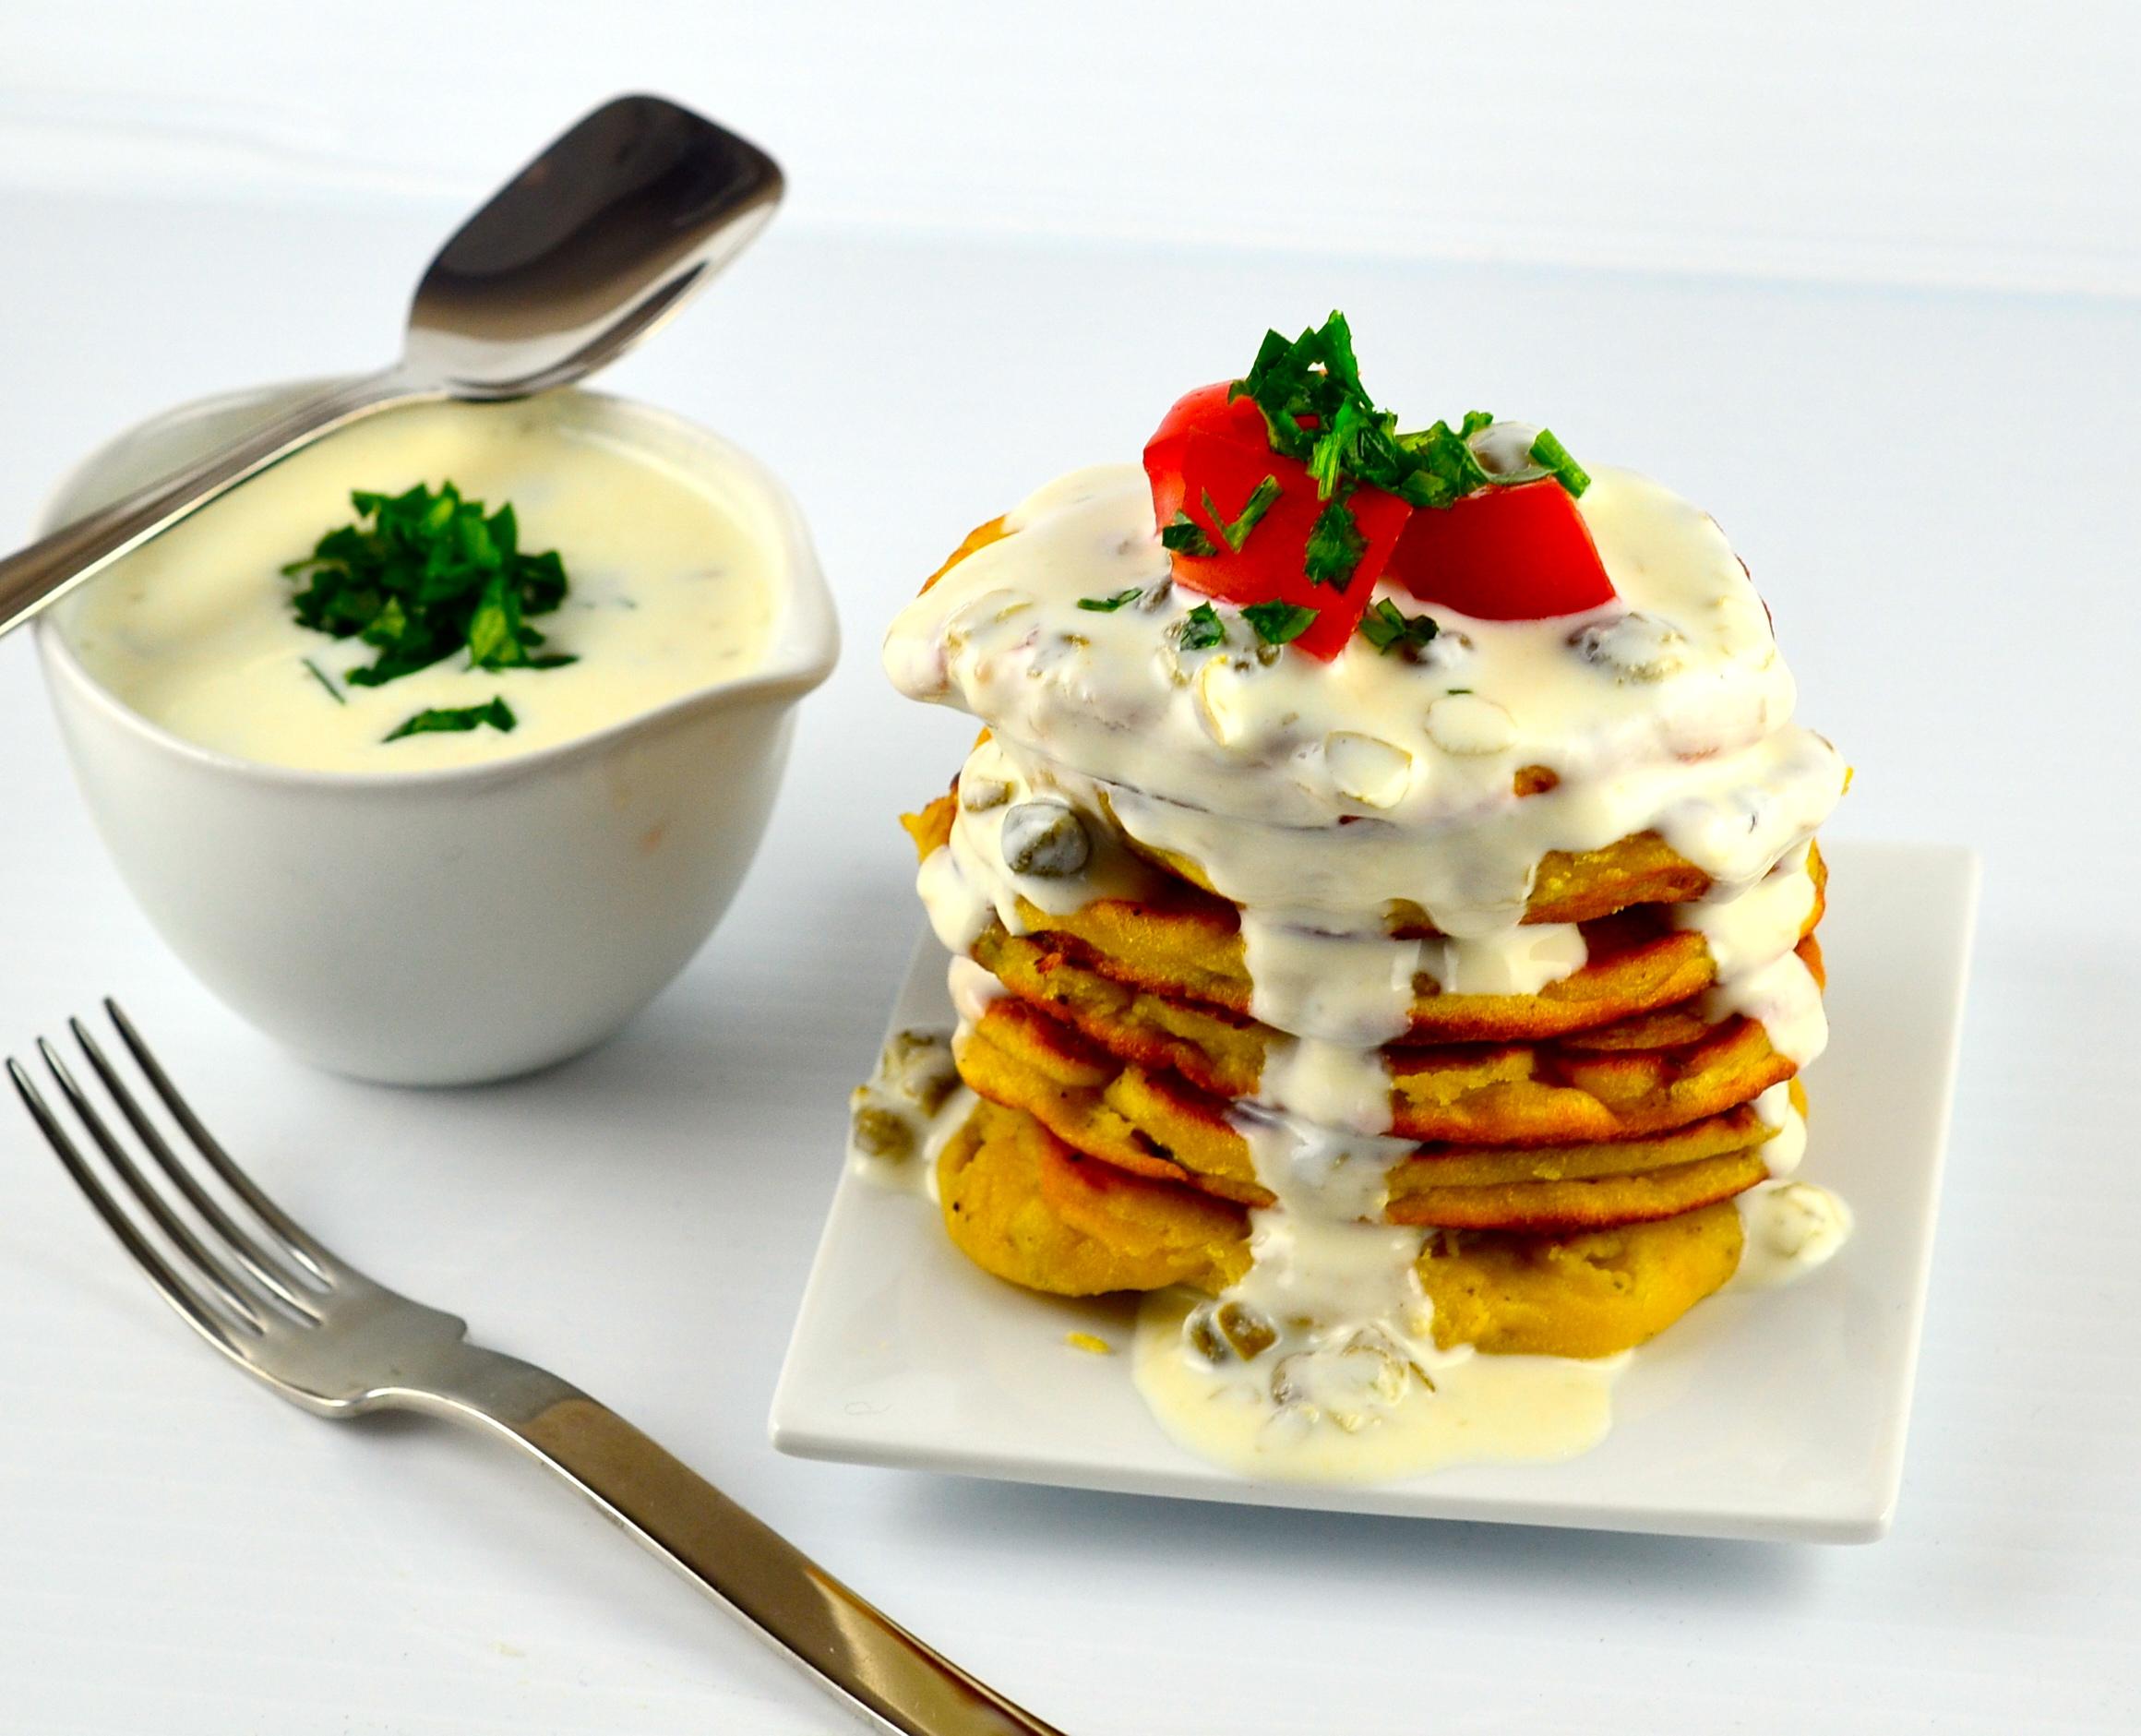 Savory Chickpea Flour & Scallion Pancakes With Greek Yogurt Caper Sauce